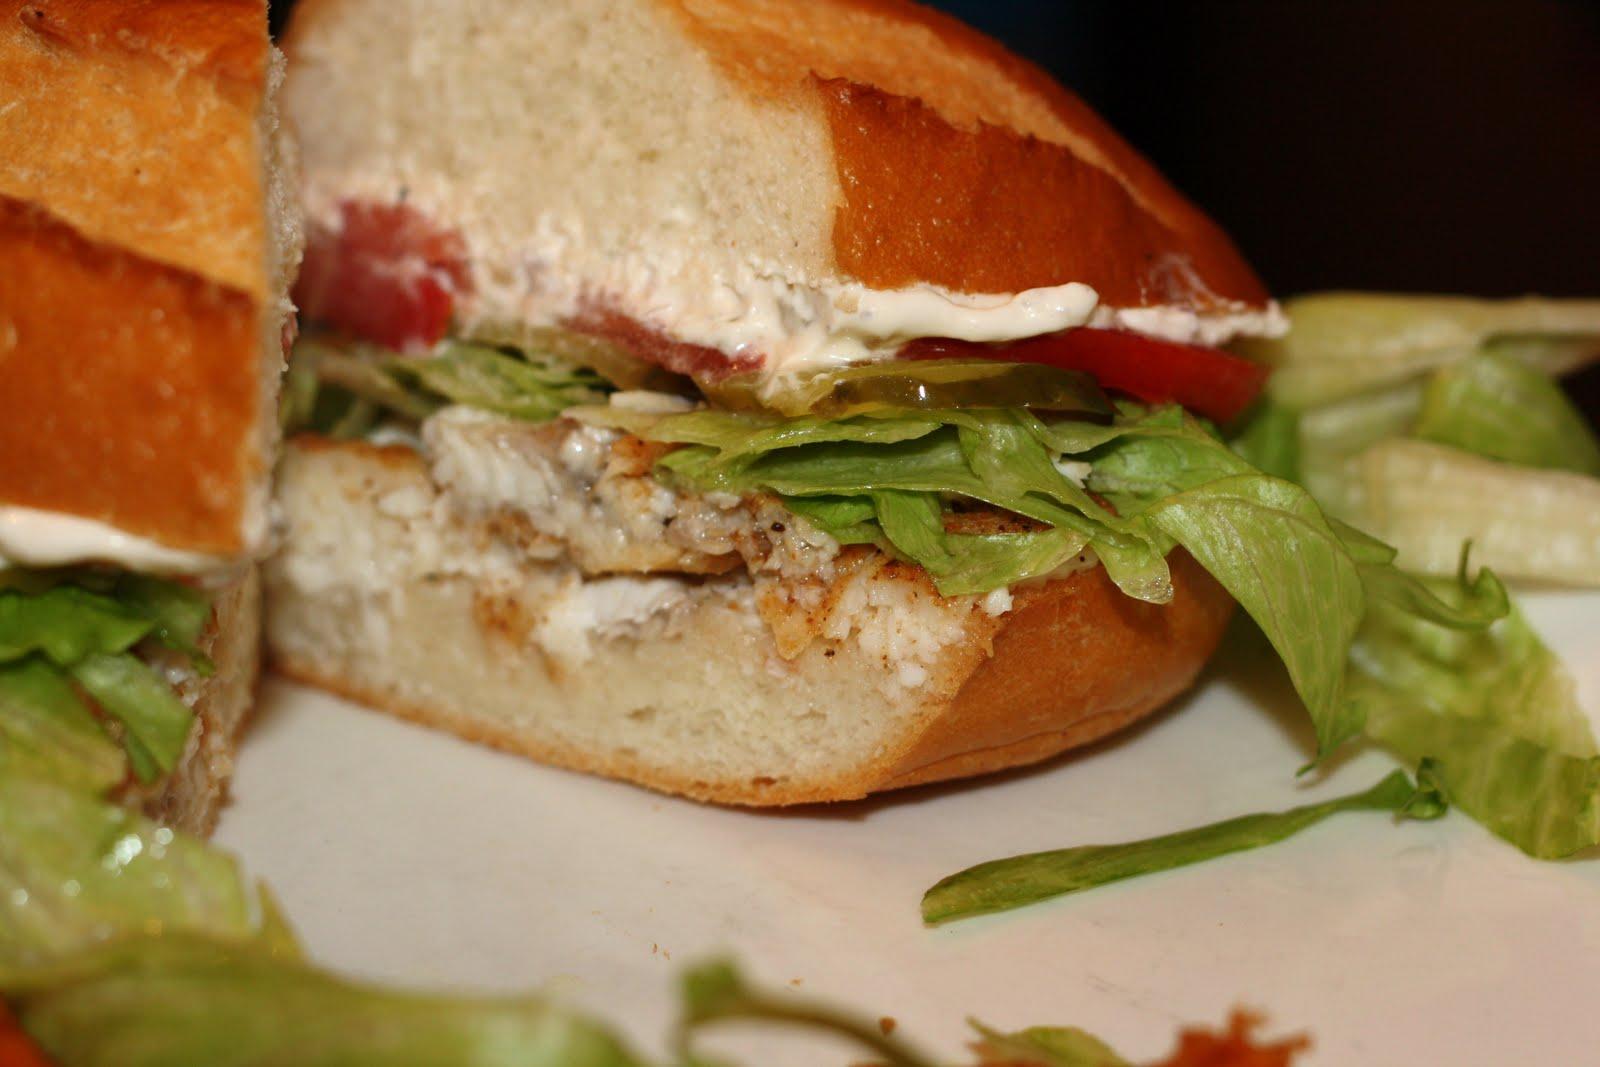 ... for dinner?: catfish po'boy with light tartar sauce... 20 minutes